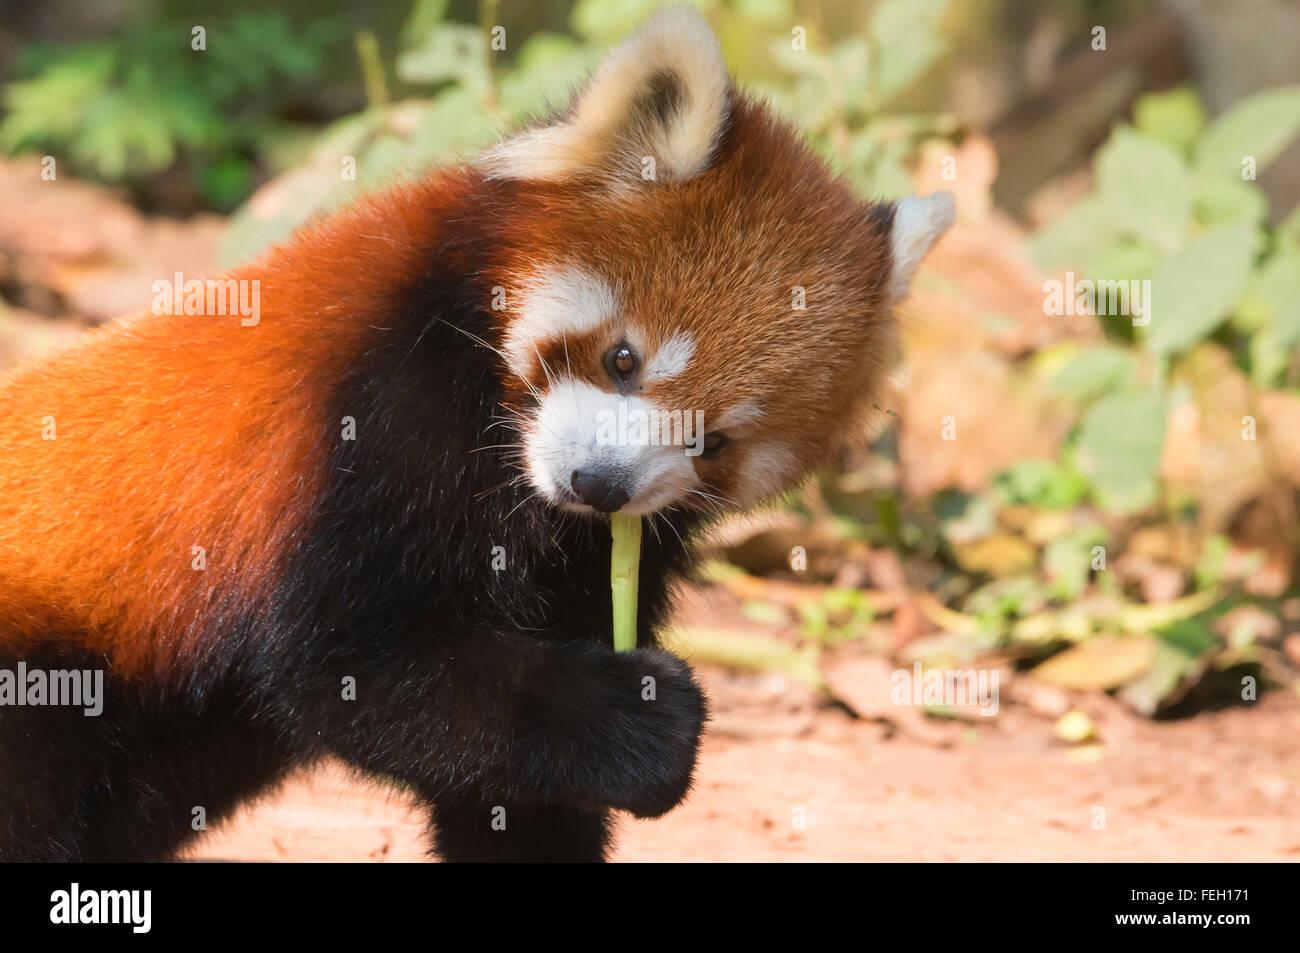 Le panda rouge (Ailurus fulgens), province du Sichuan, Chine Photo Stock